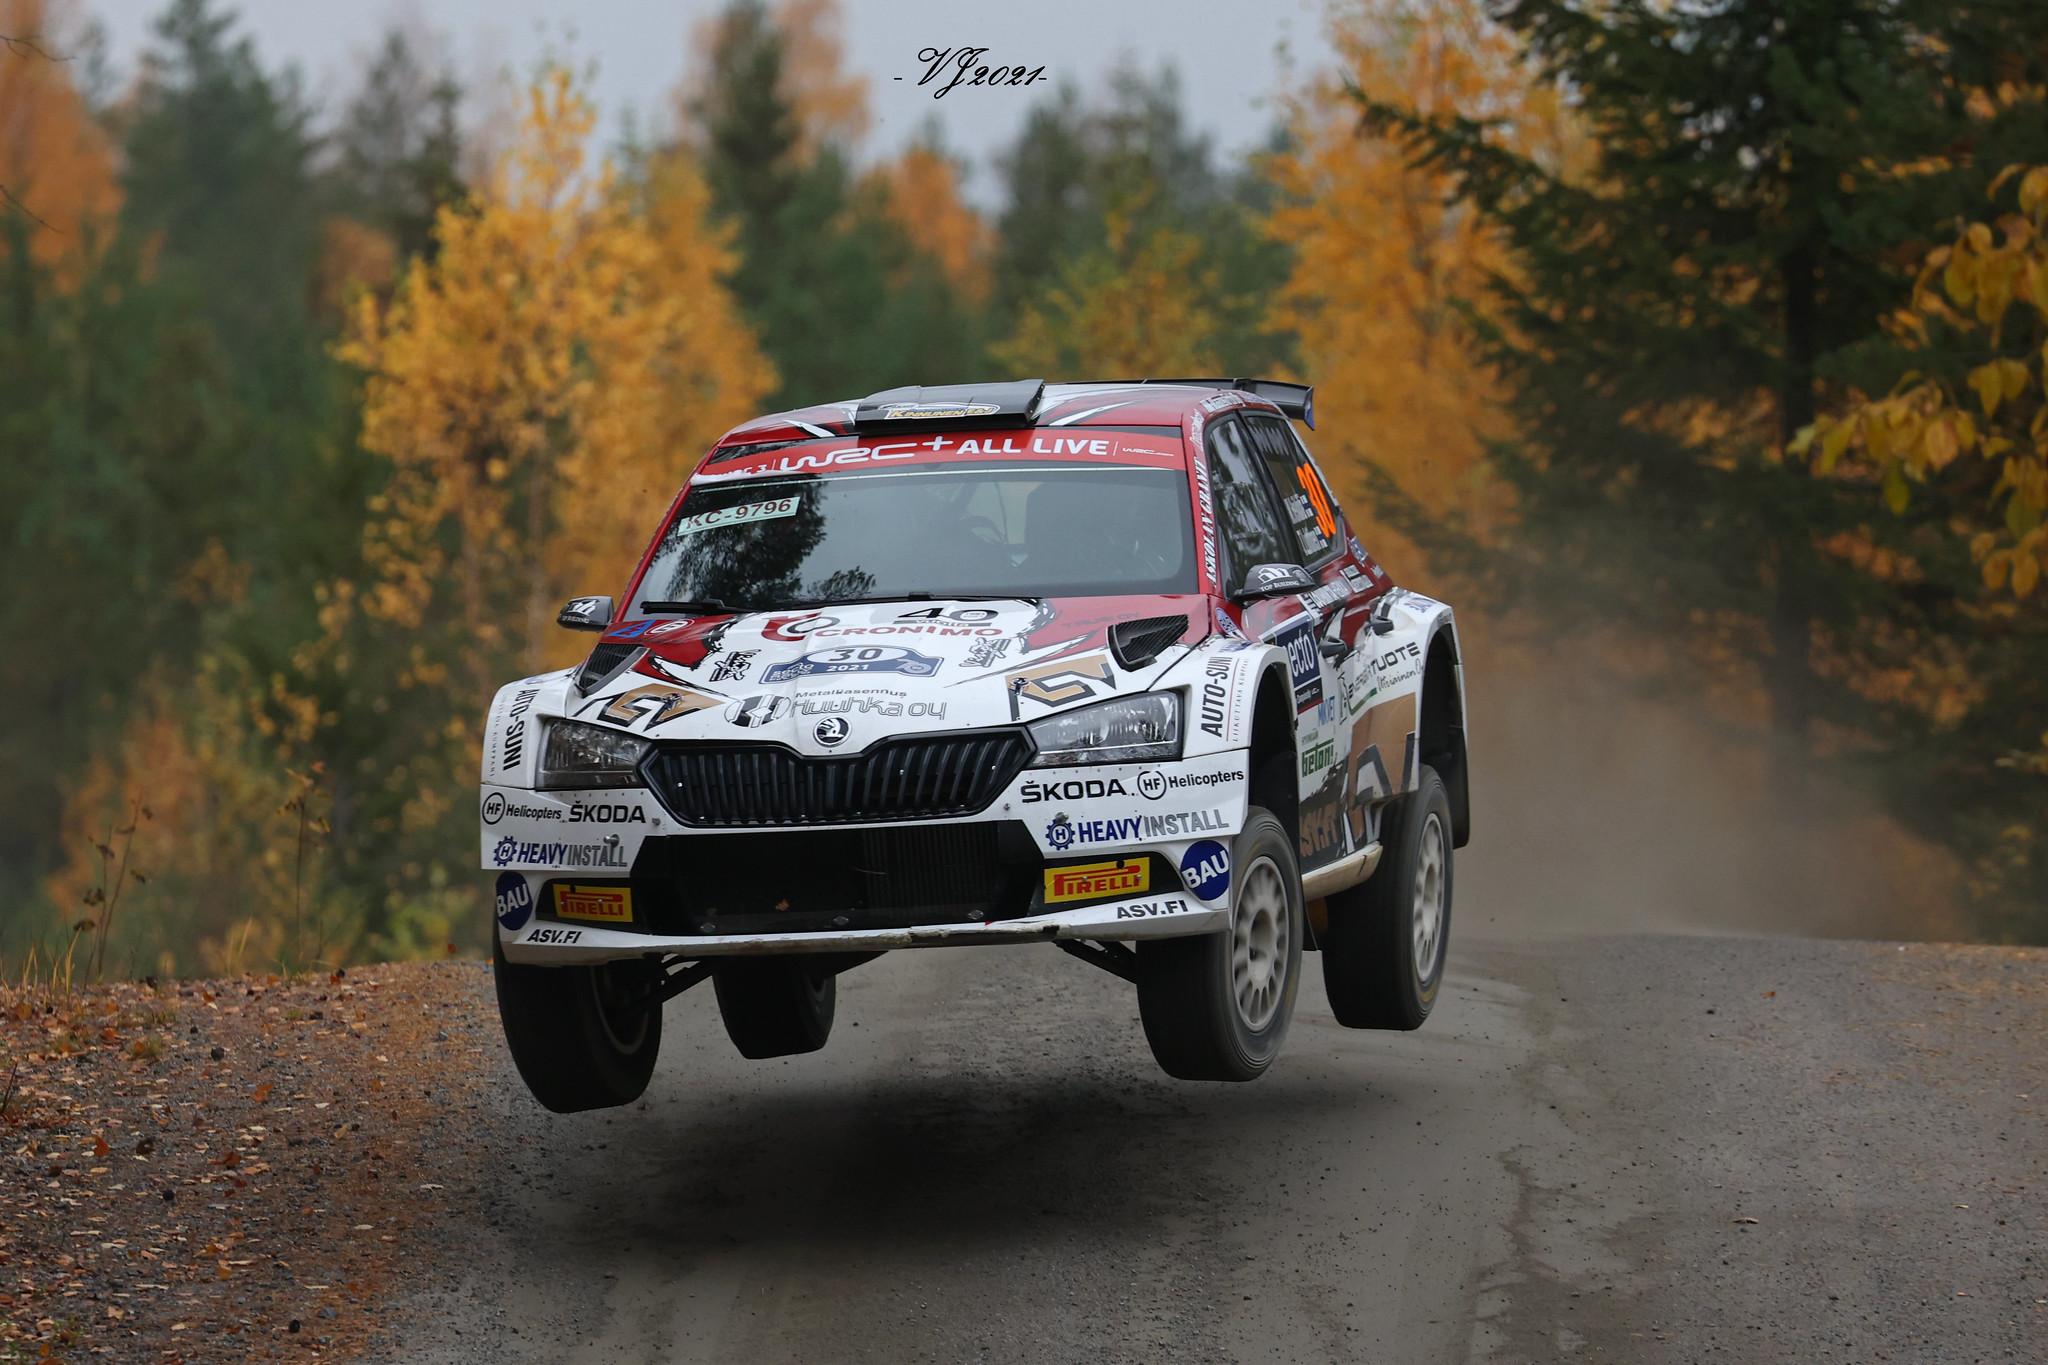 Mikko Heikkilä, Skoda Fabia R5